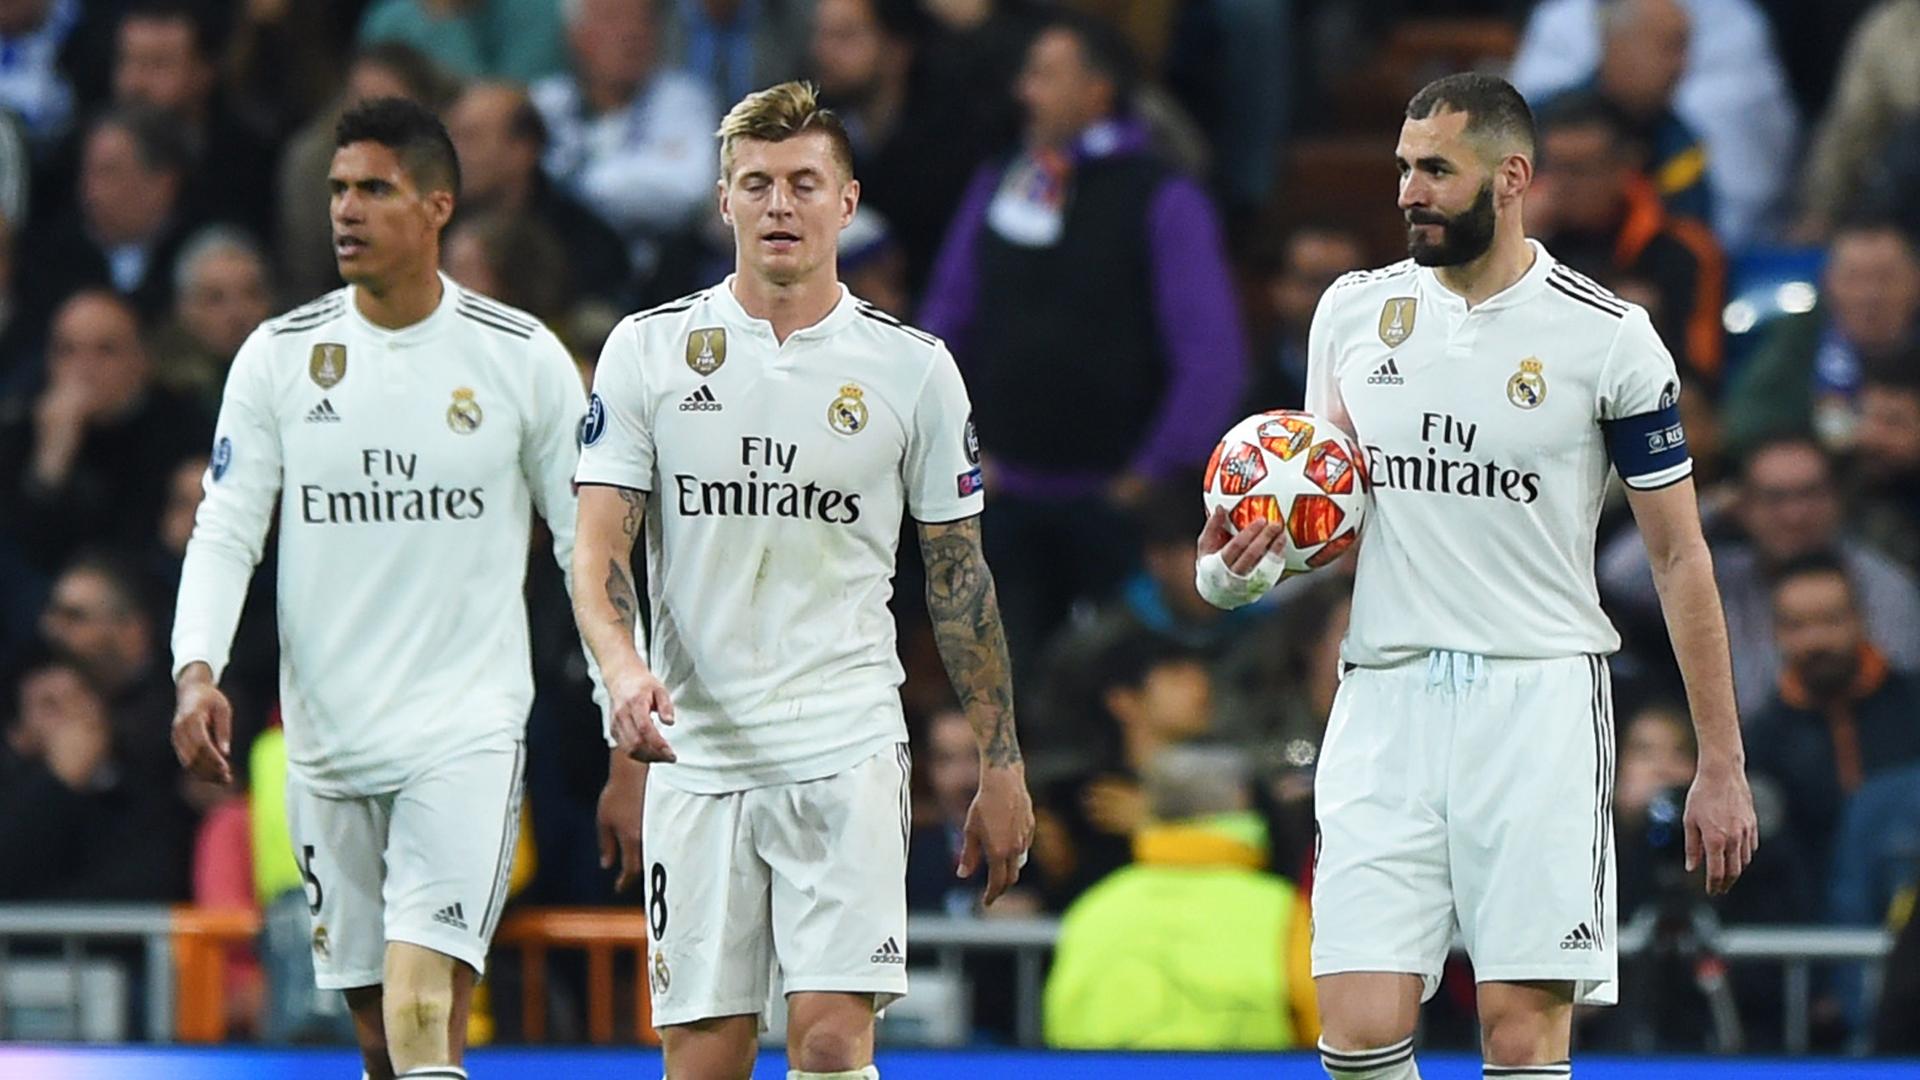 Les répercussions de la victoire de l'Ajax sur le Real Madrid